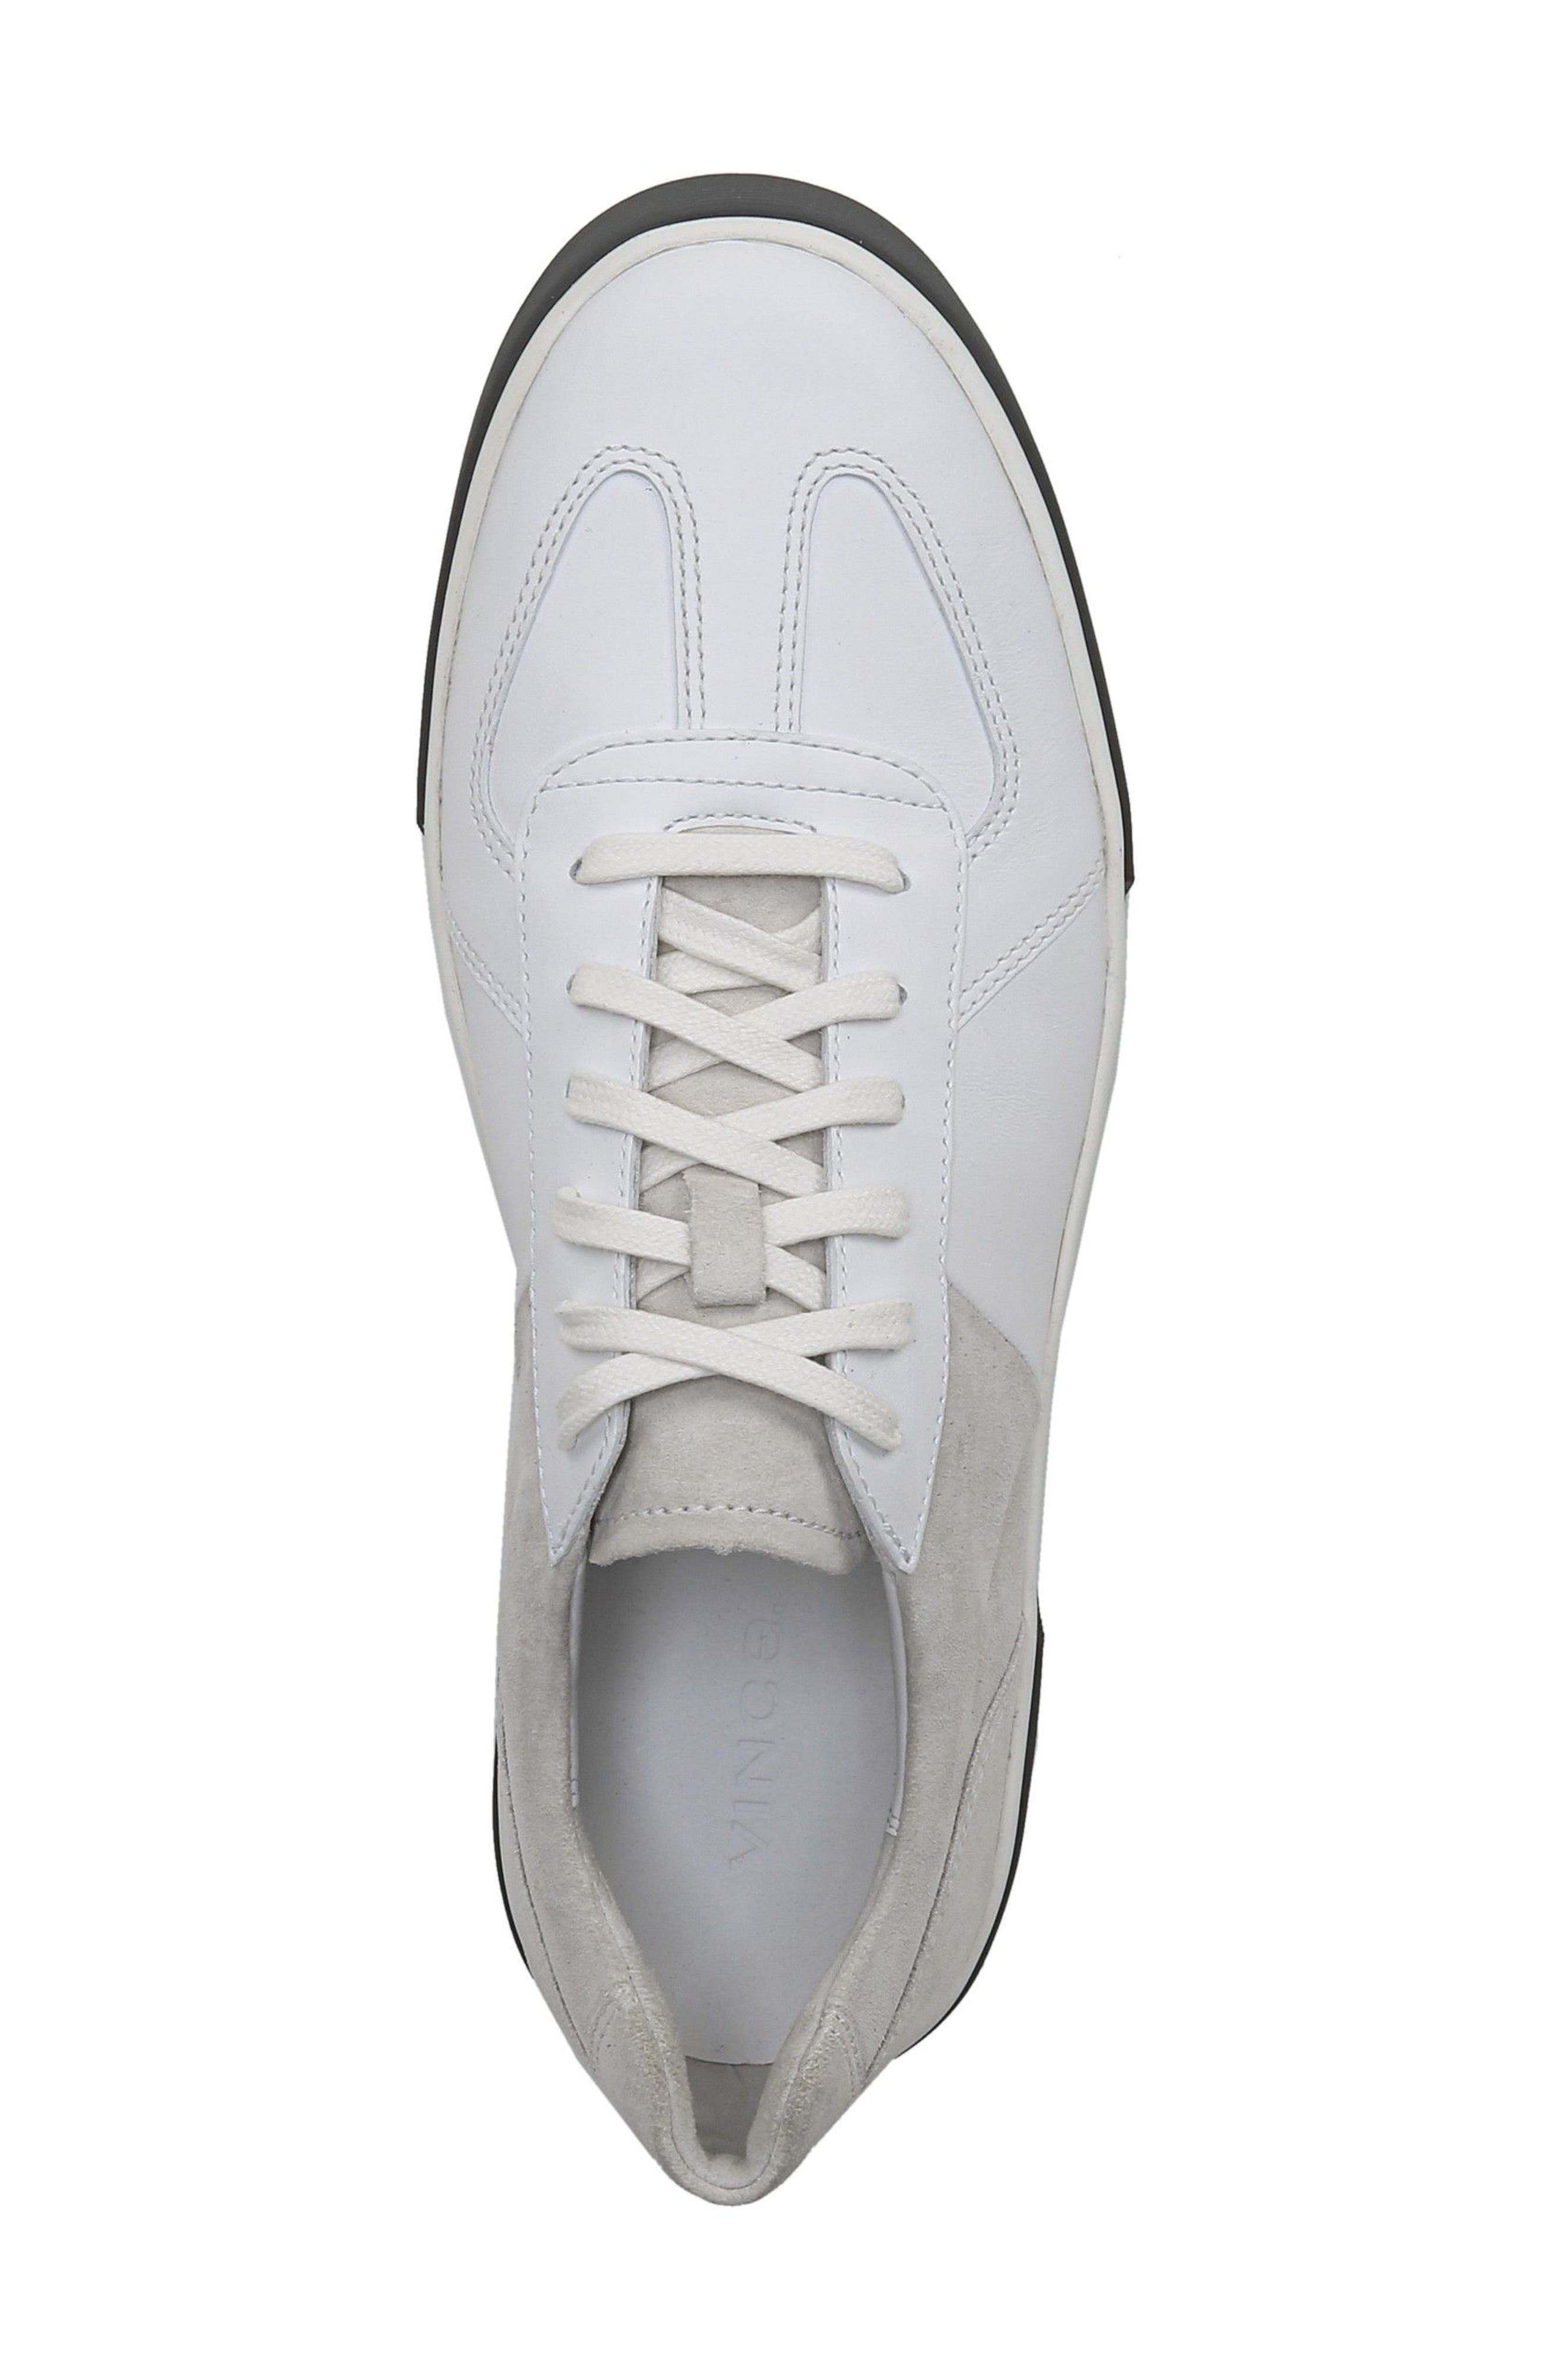 VINCE, Rogue Low Top Sneaker, Alternate thumbnail 4, color, WHITE/ HORCHATA